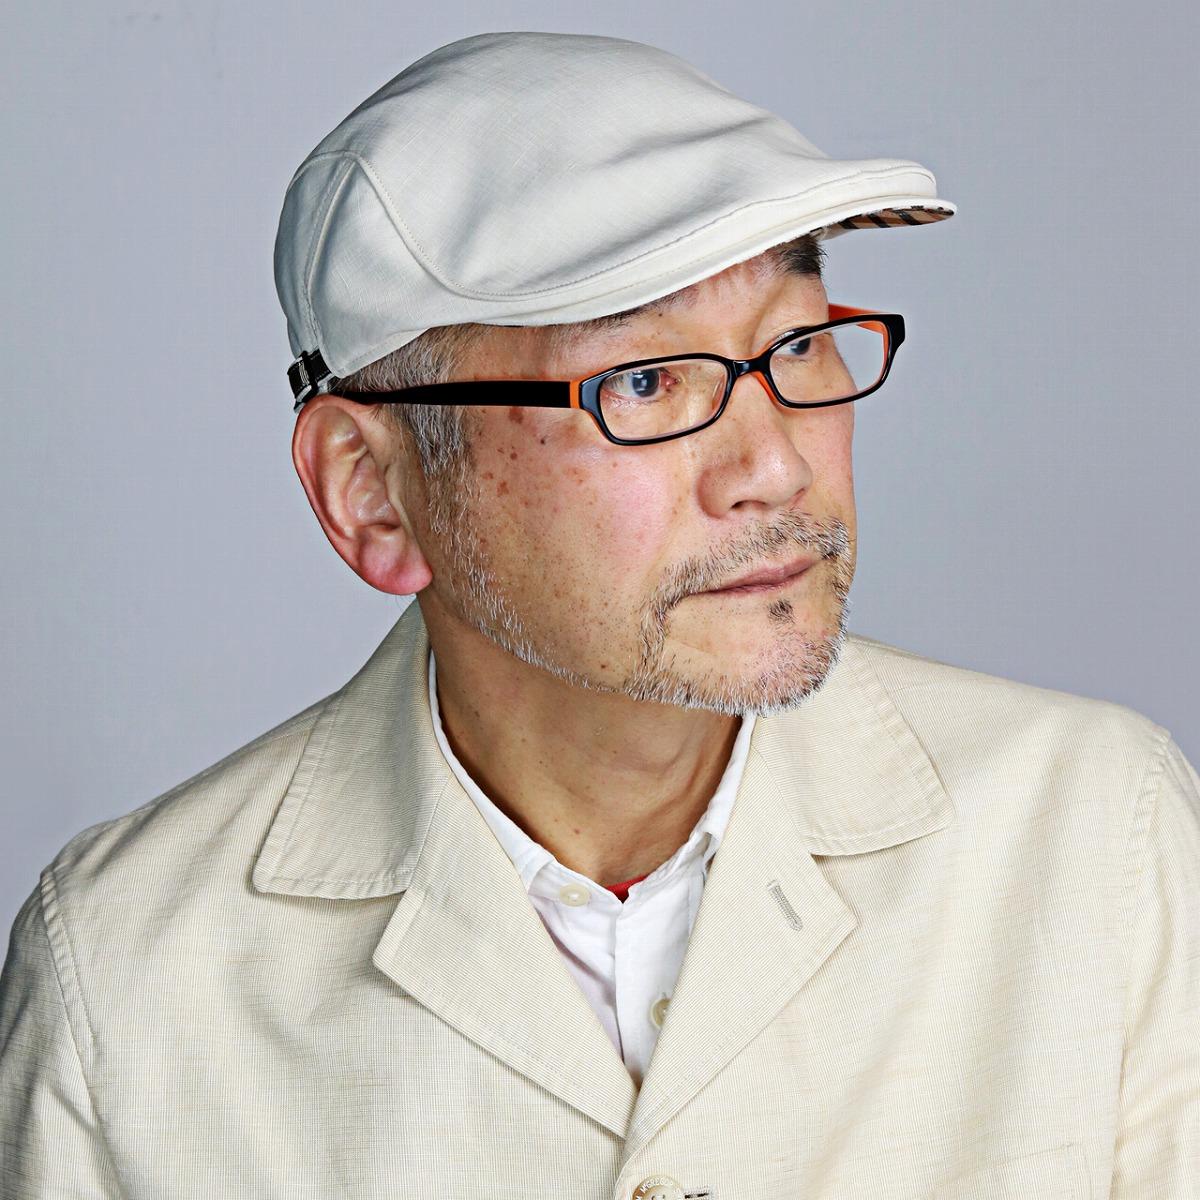 DAKS ハンチング メンズ 麻 シャンブレー ダックス 帽子 春夏 リネン ハンチング帽 紳士 帽子 上品 日本製 イギリス ハット ブランド 大人 シンプル 無地 S M L LL / ベージュ [ ivy cap ] ギフト プレゼント